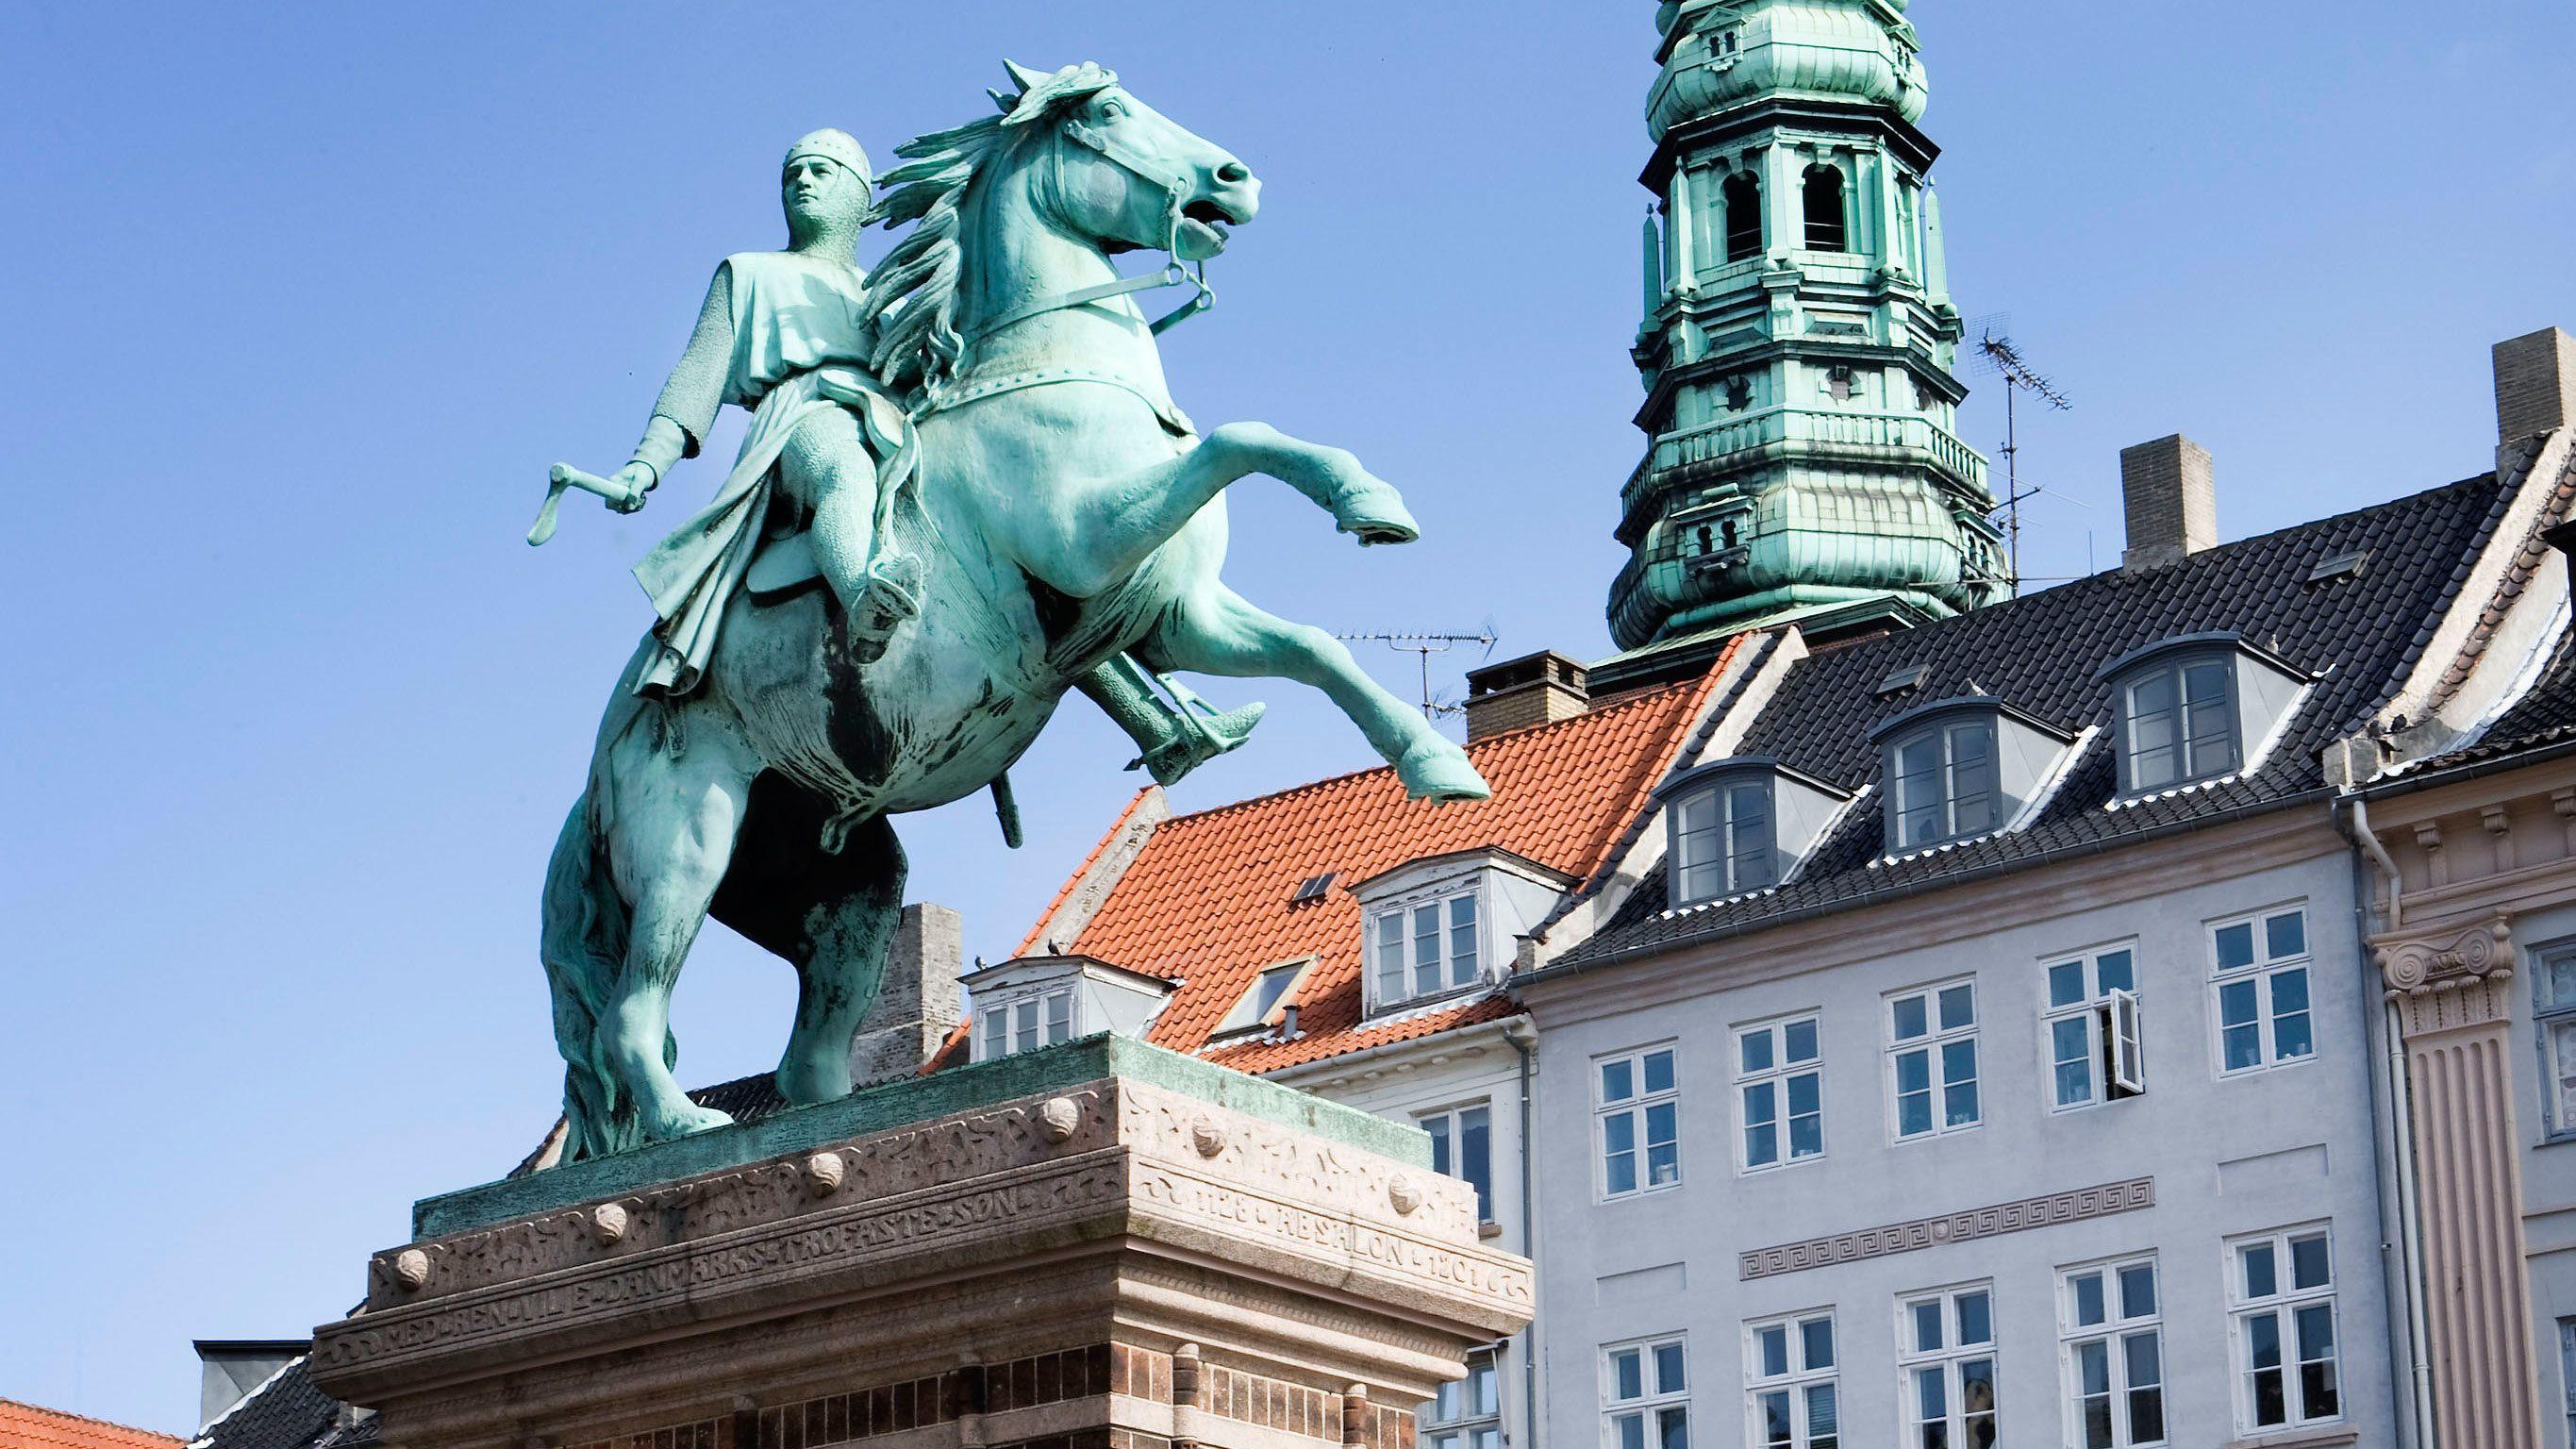 Statue of horse riding knight in Copenhagen